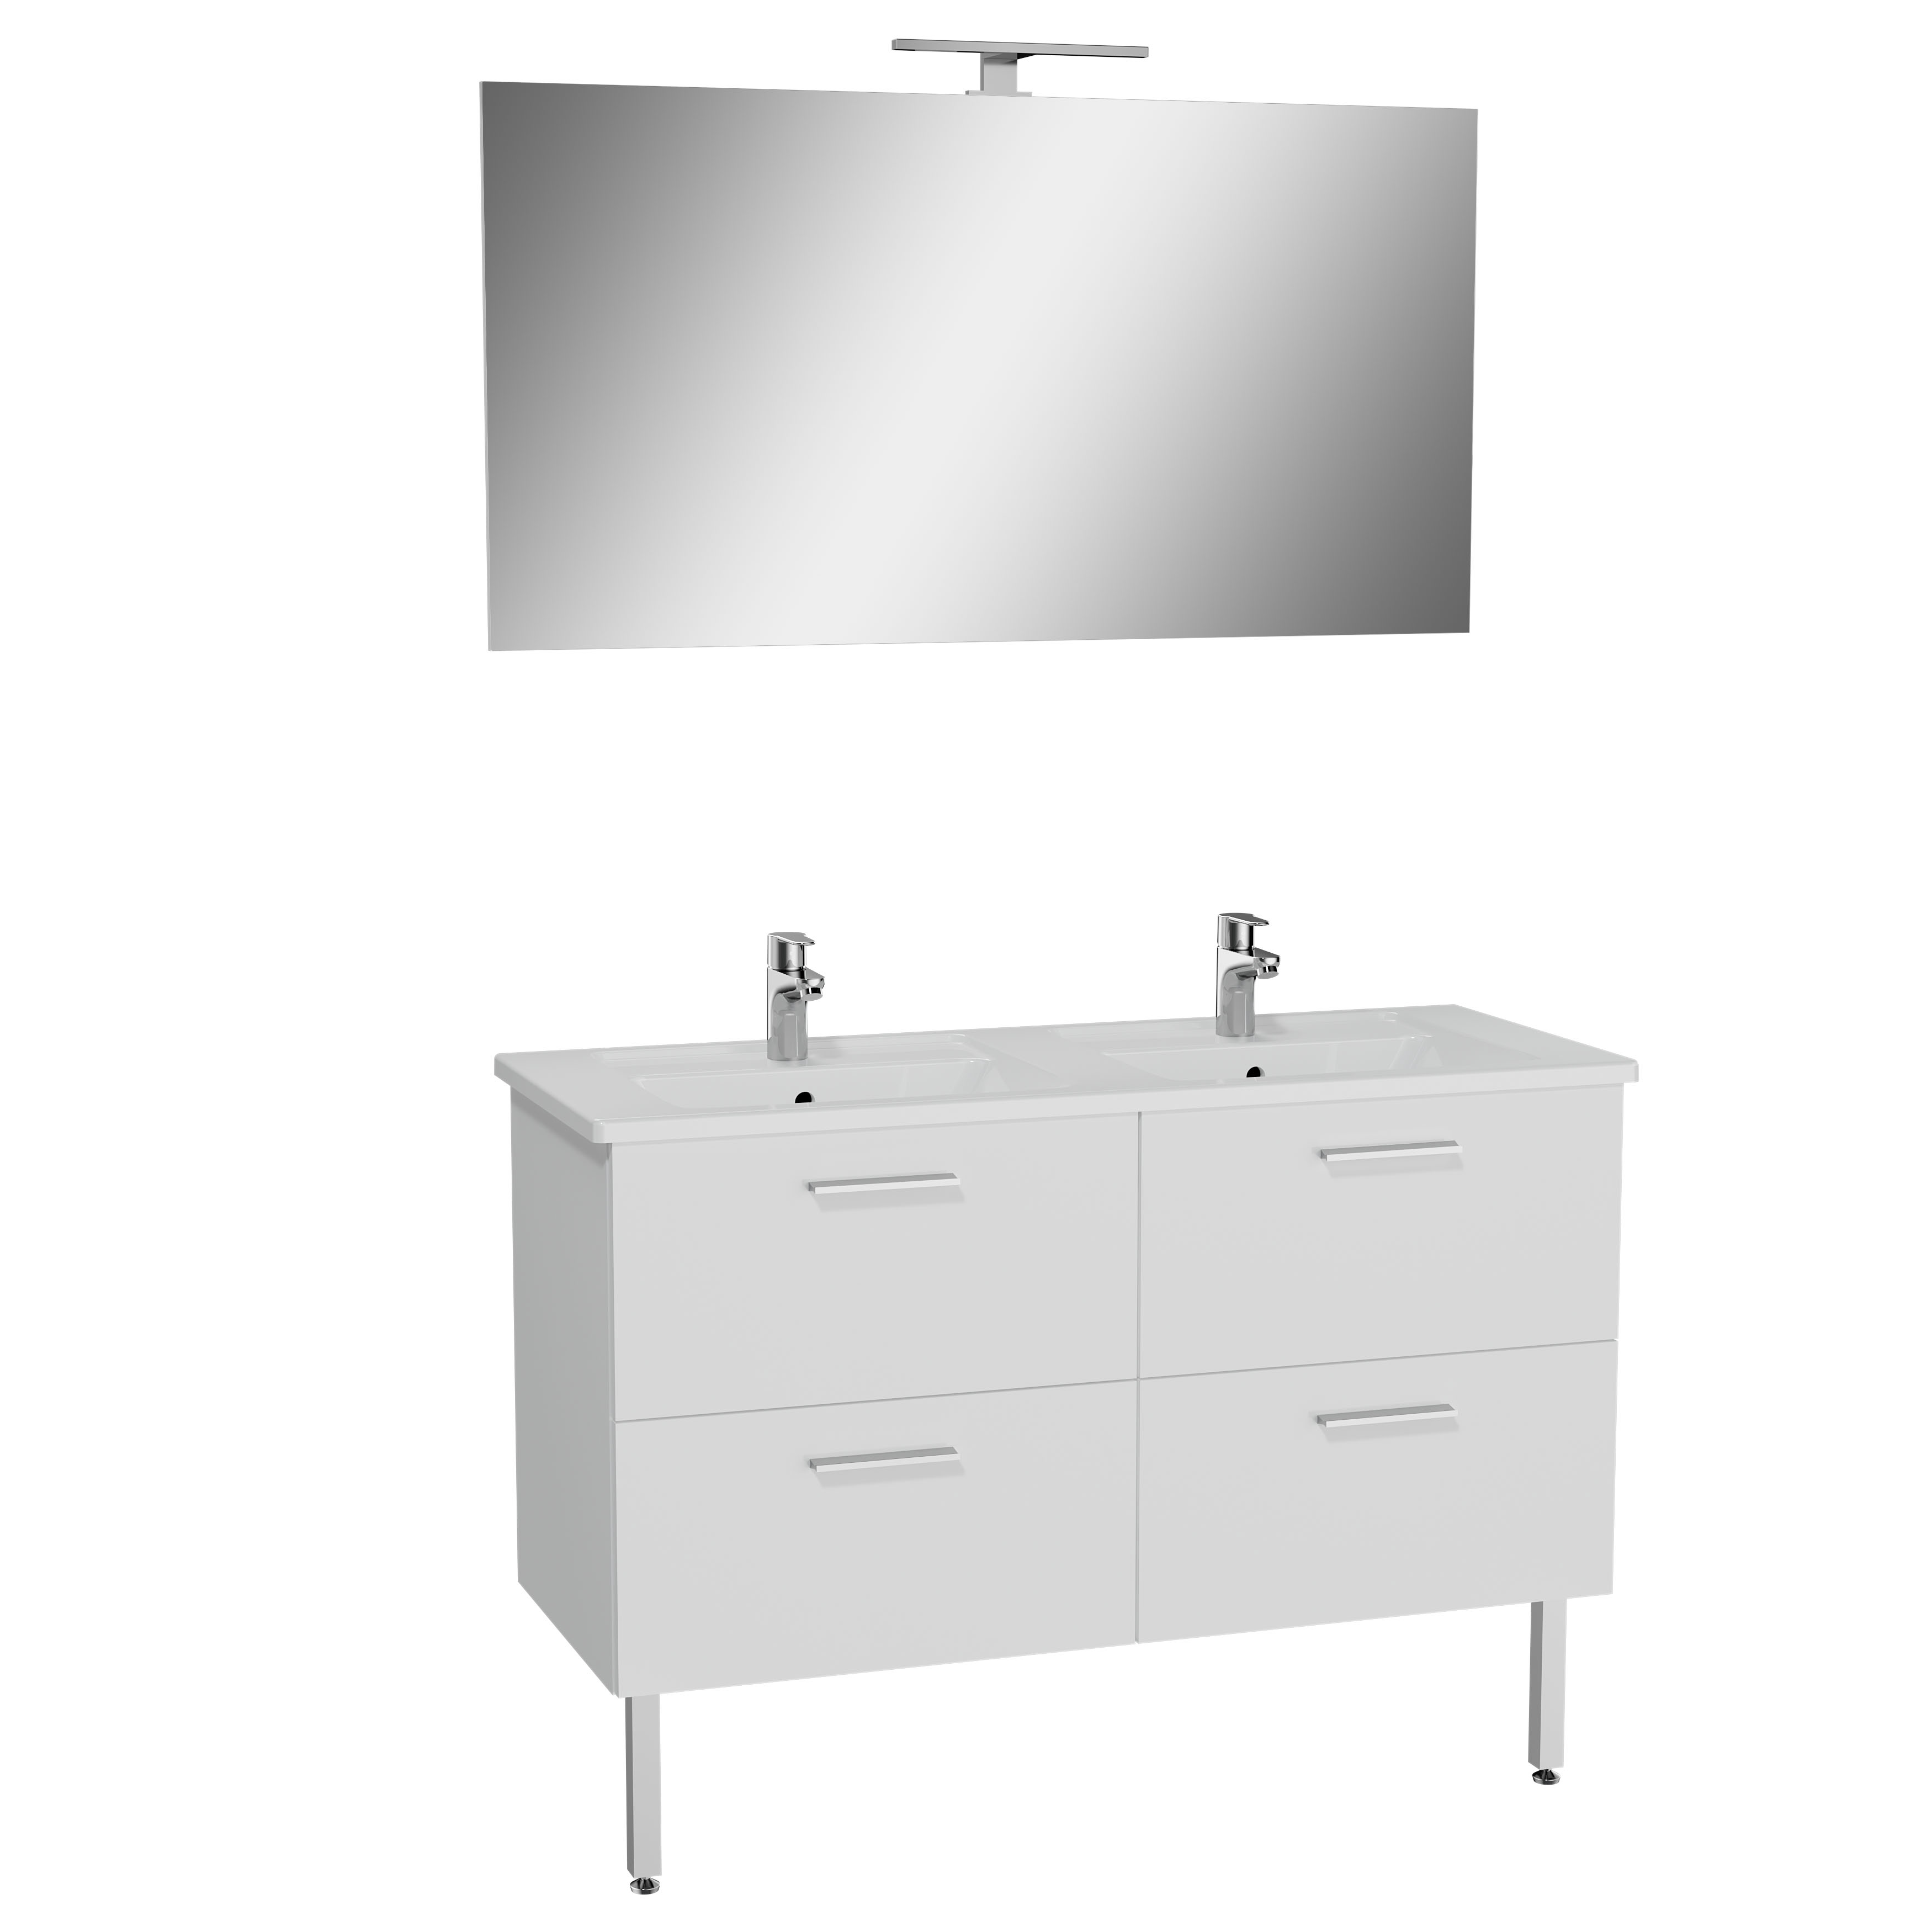 Mia set de meuble, avec 4 tiroirs, 120 cm, blanc